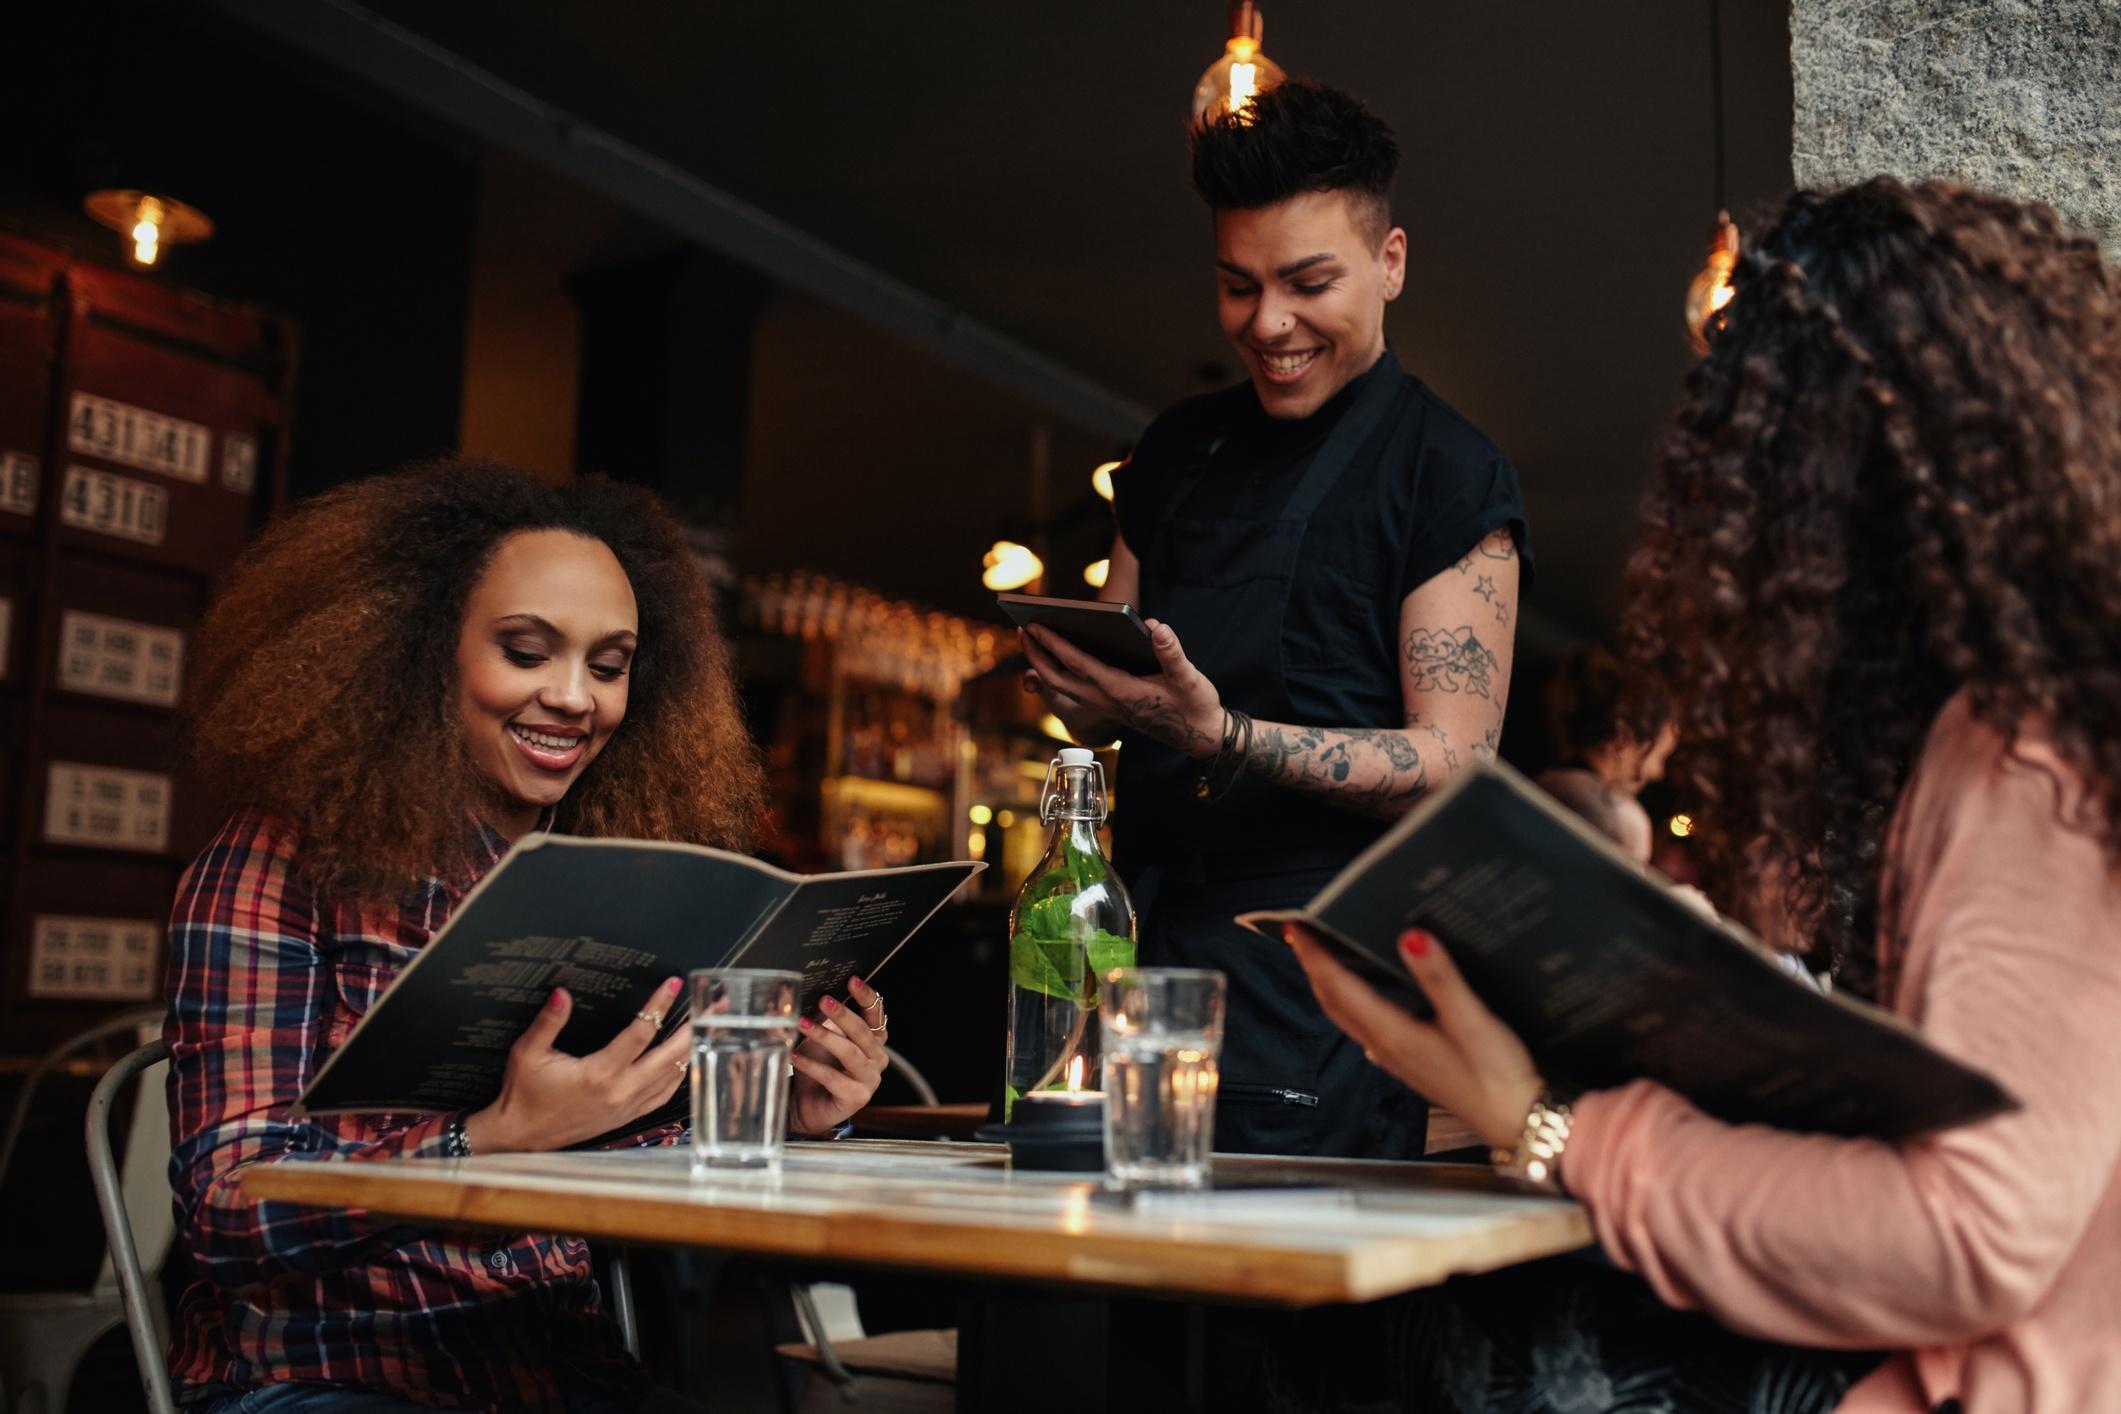 6-really-good-restaurant-menu-design-tips-that-maximize-profits.jpg